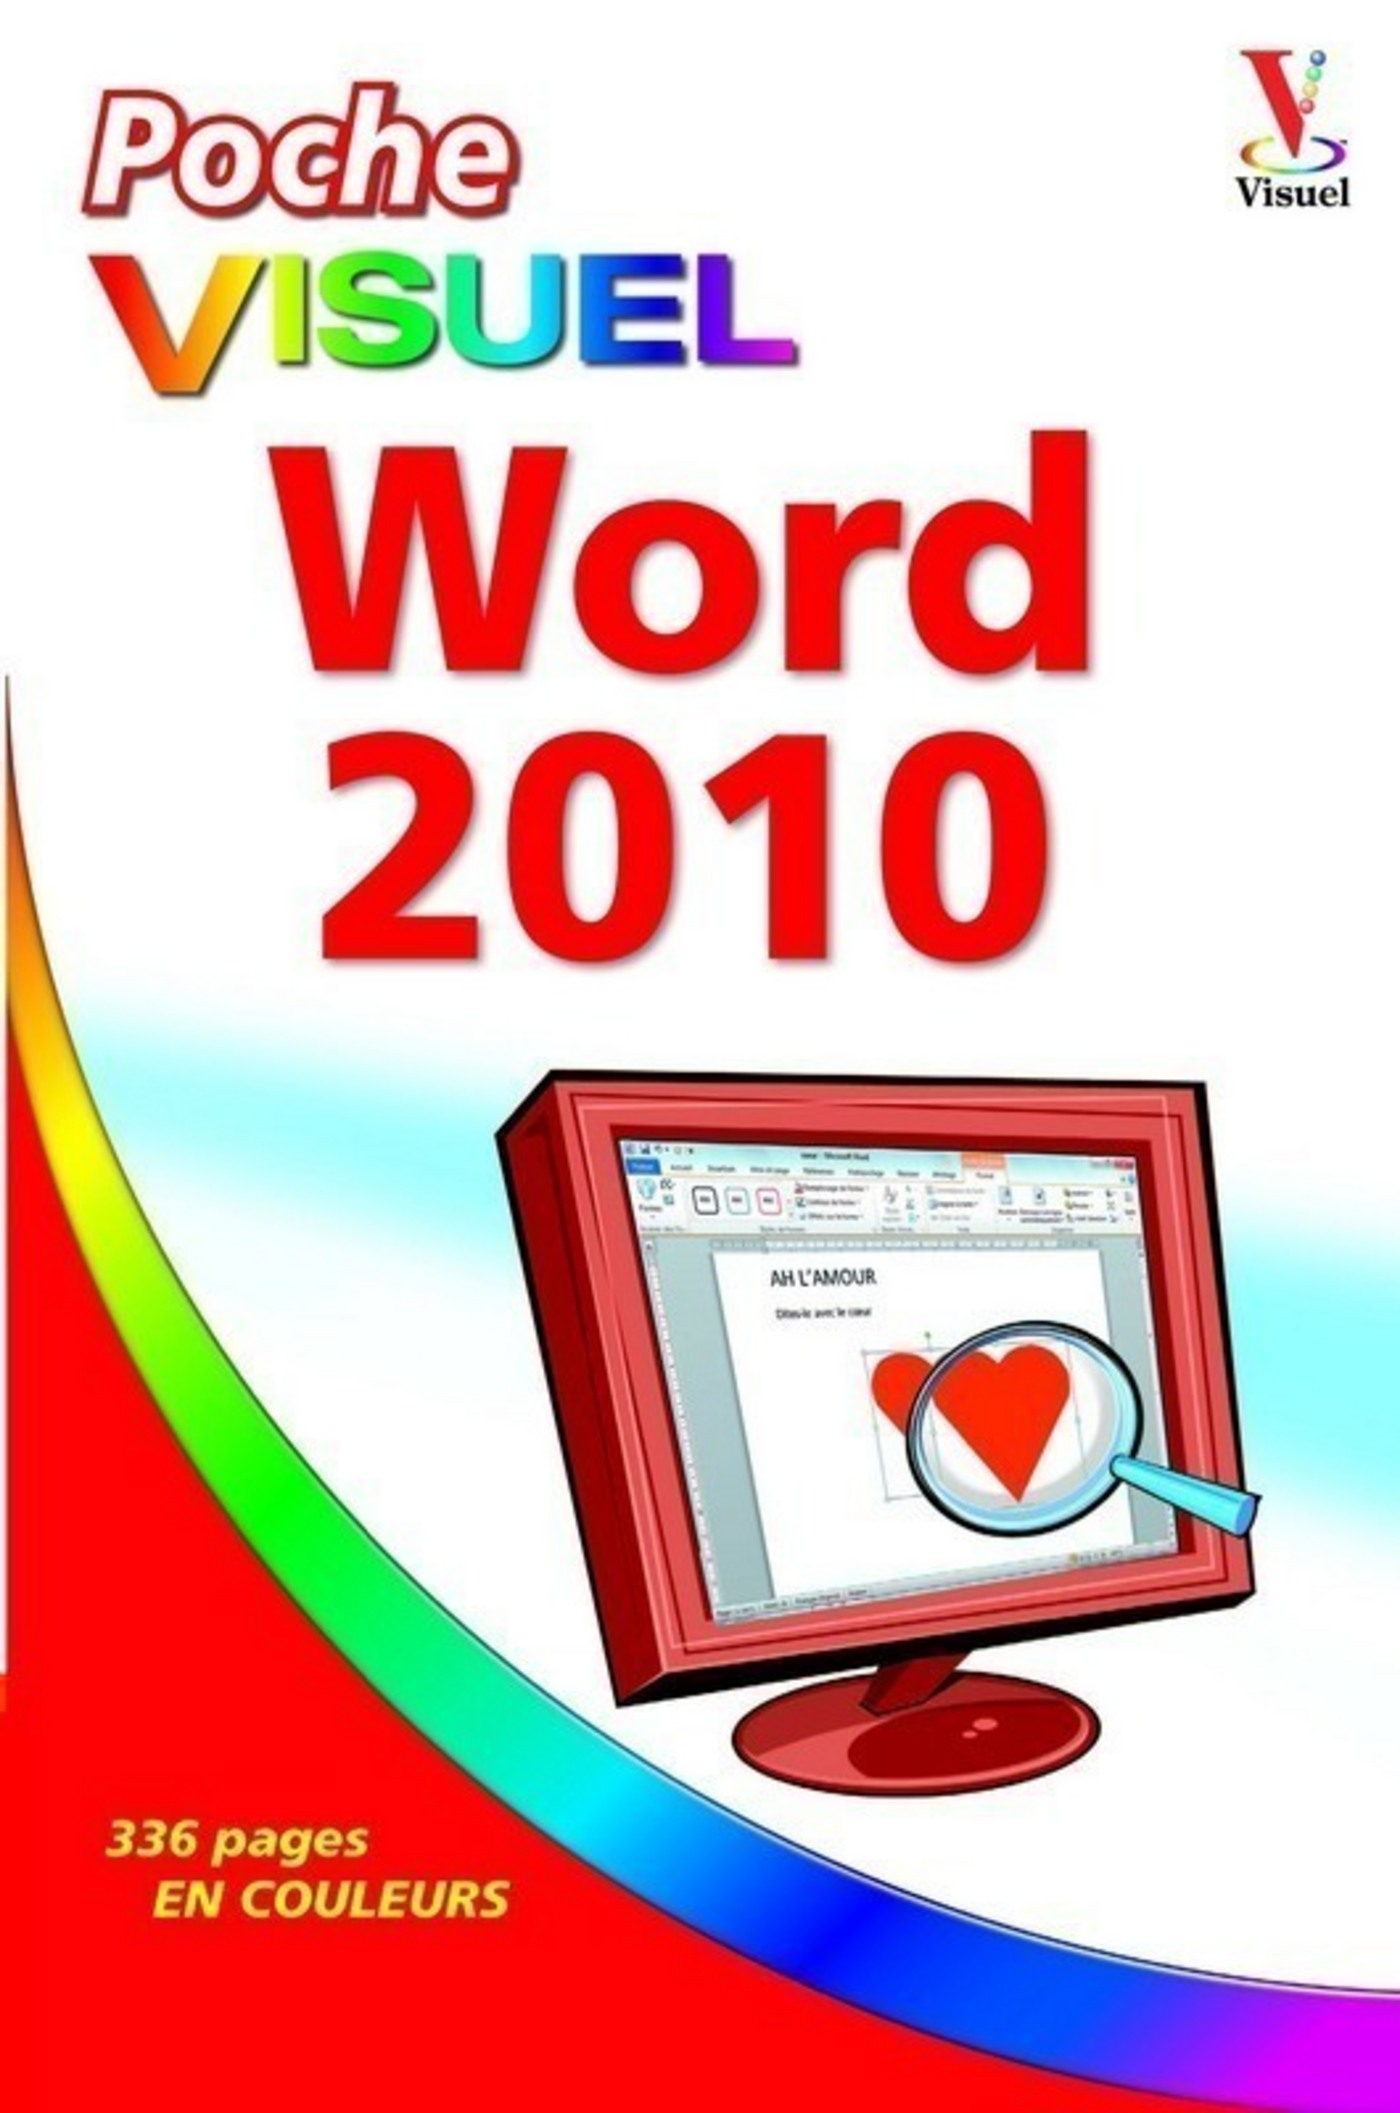 Poche Visuel Word 2010